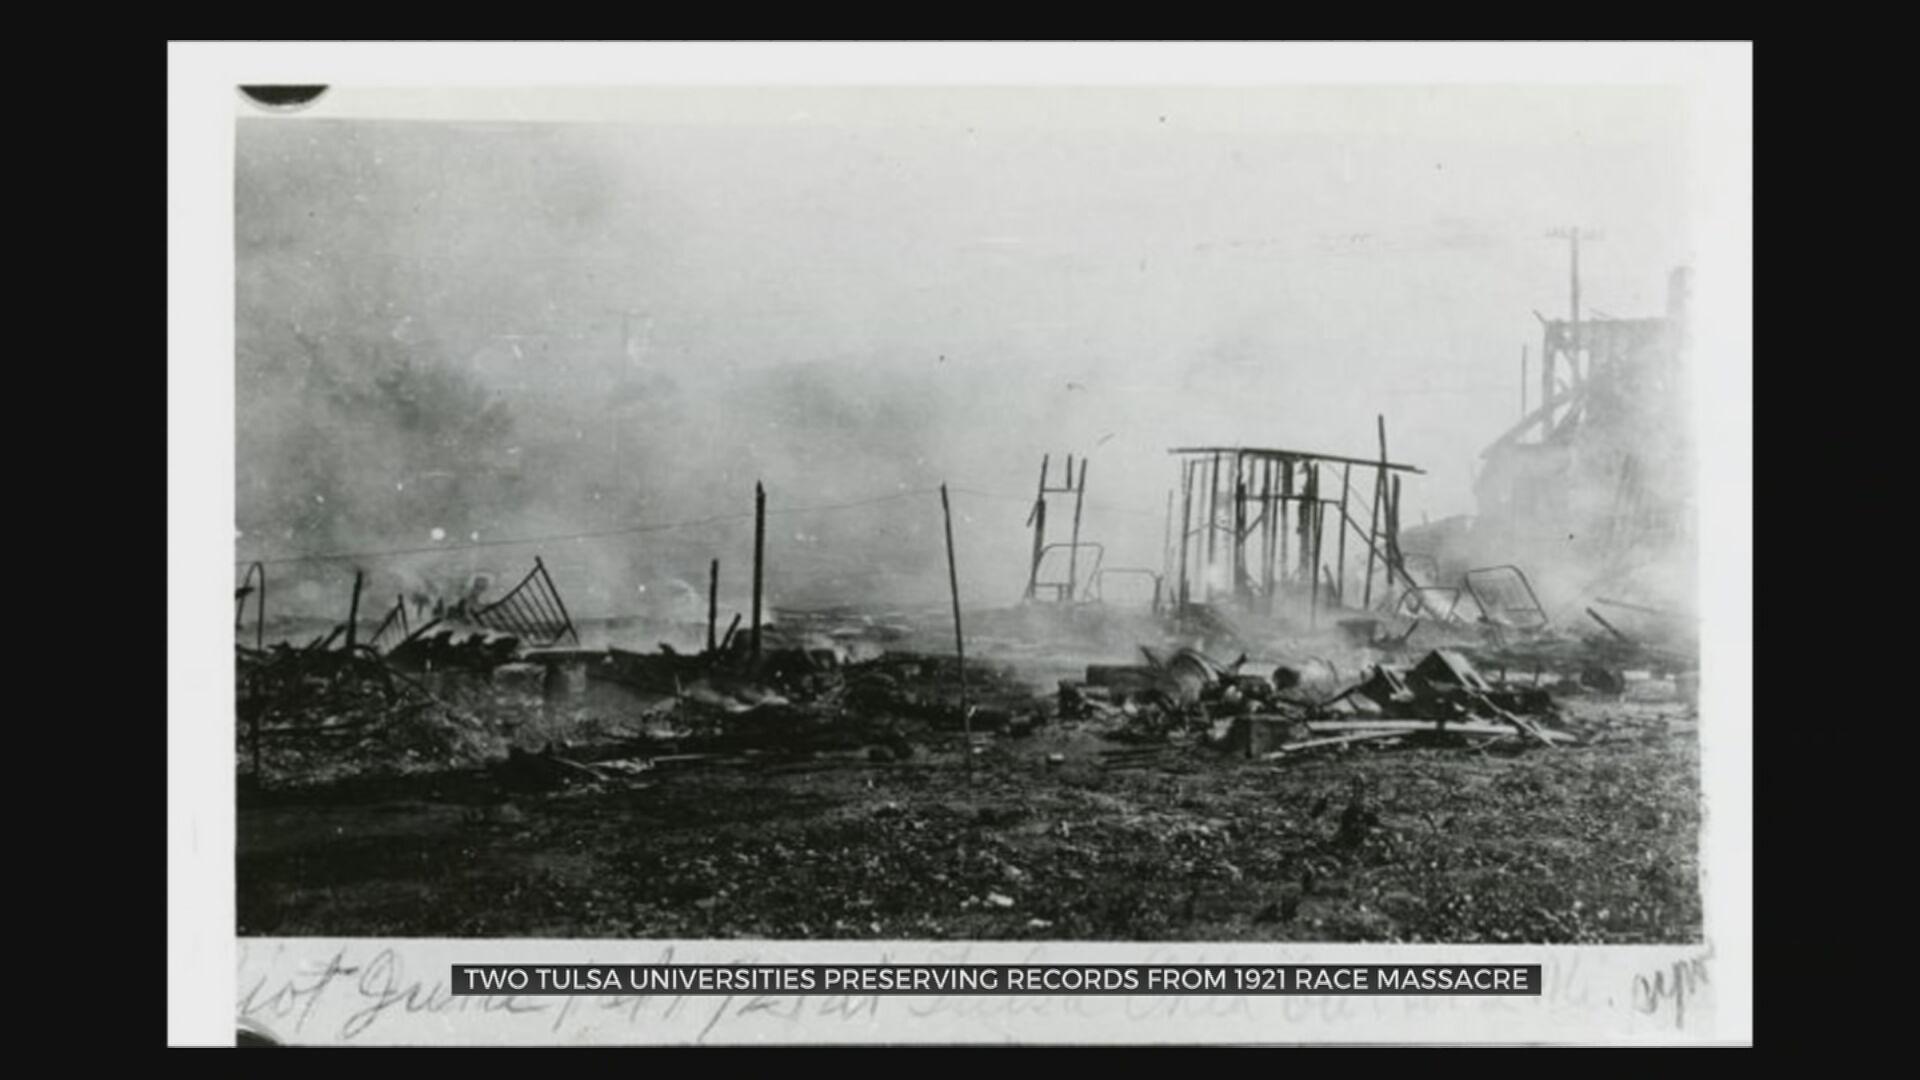 'Bring It To Light': University Archives Hold Story Of Tulsa Race Massacre